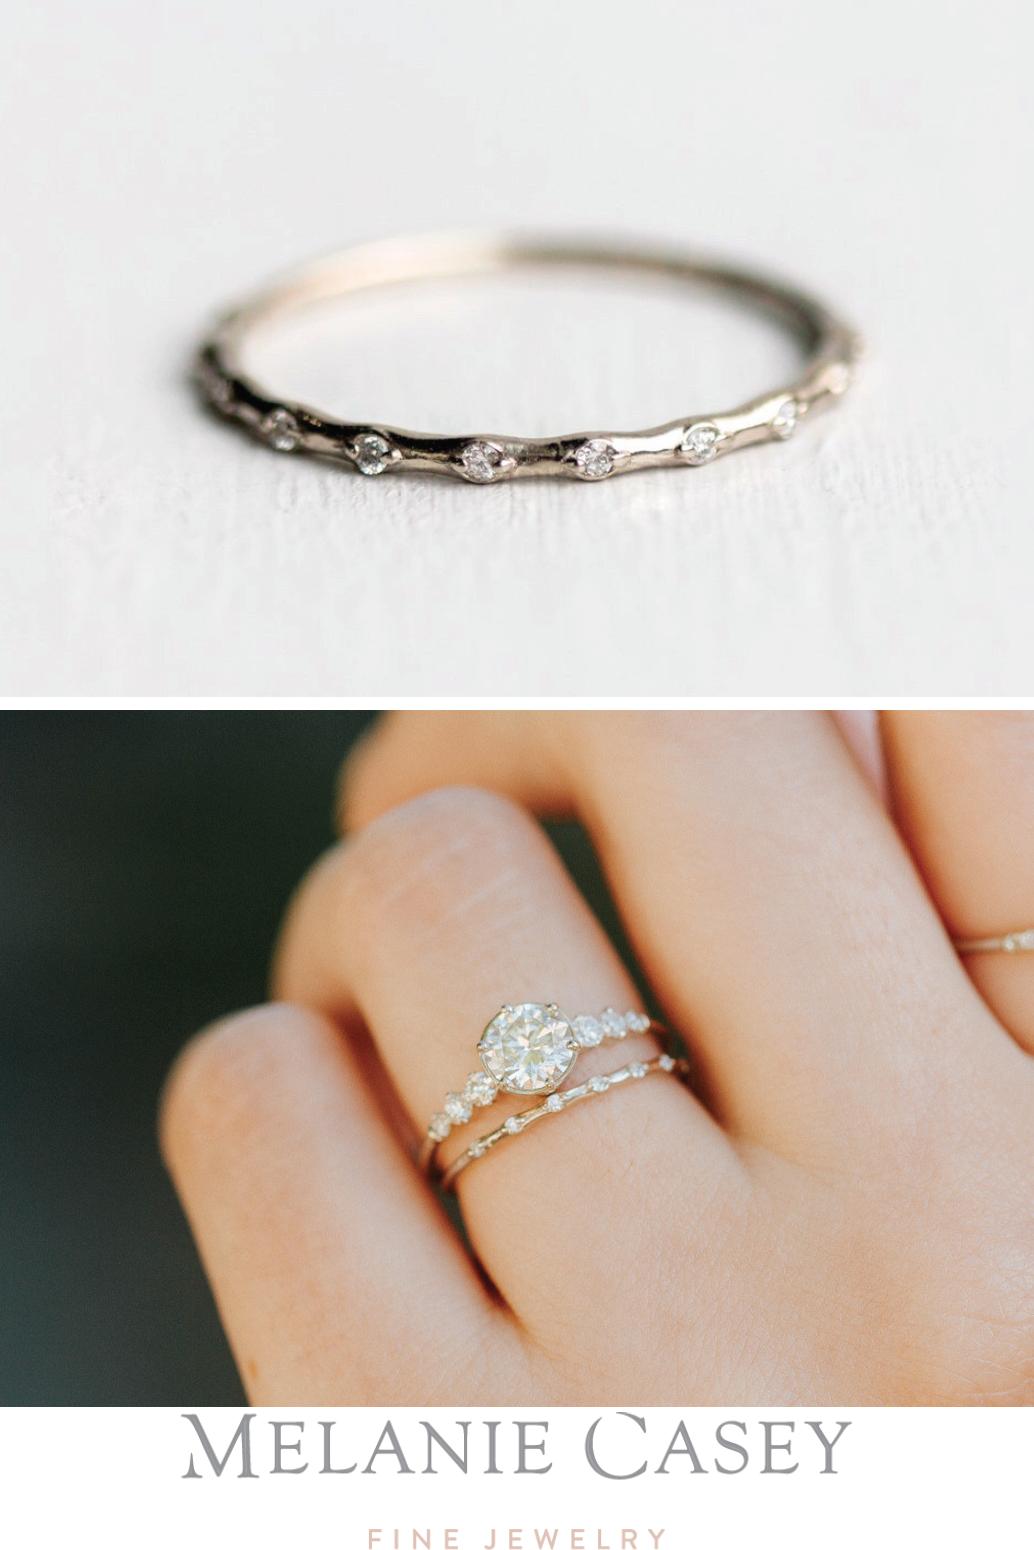 Certified E F Vvs Vs Diamond Wedding Band 14k White Gold Sale Diamond Wedding Bands Wedding Rings Wedding Bands